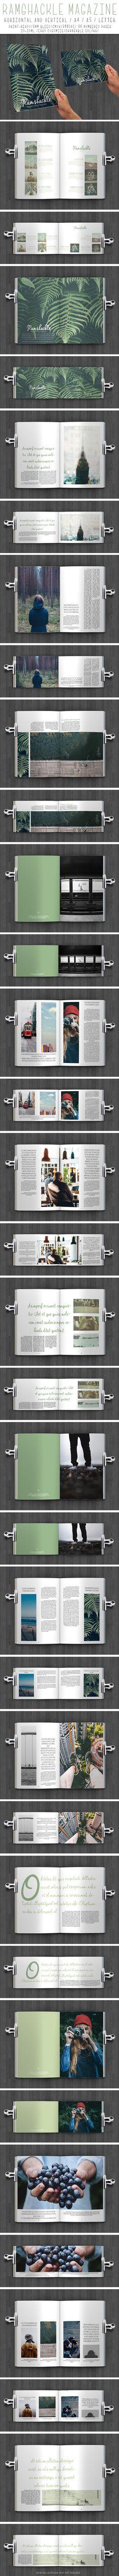 Ramshackle Magazine - crew55design